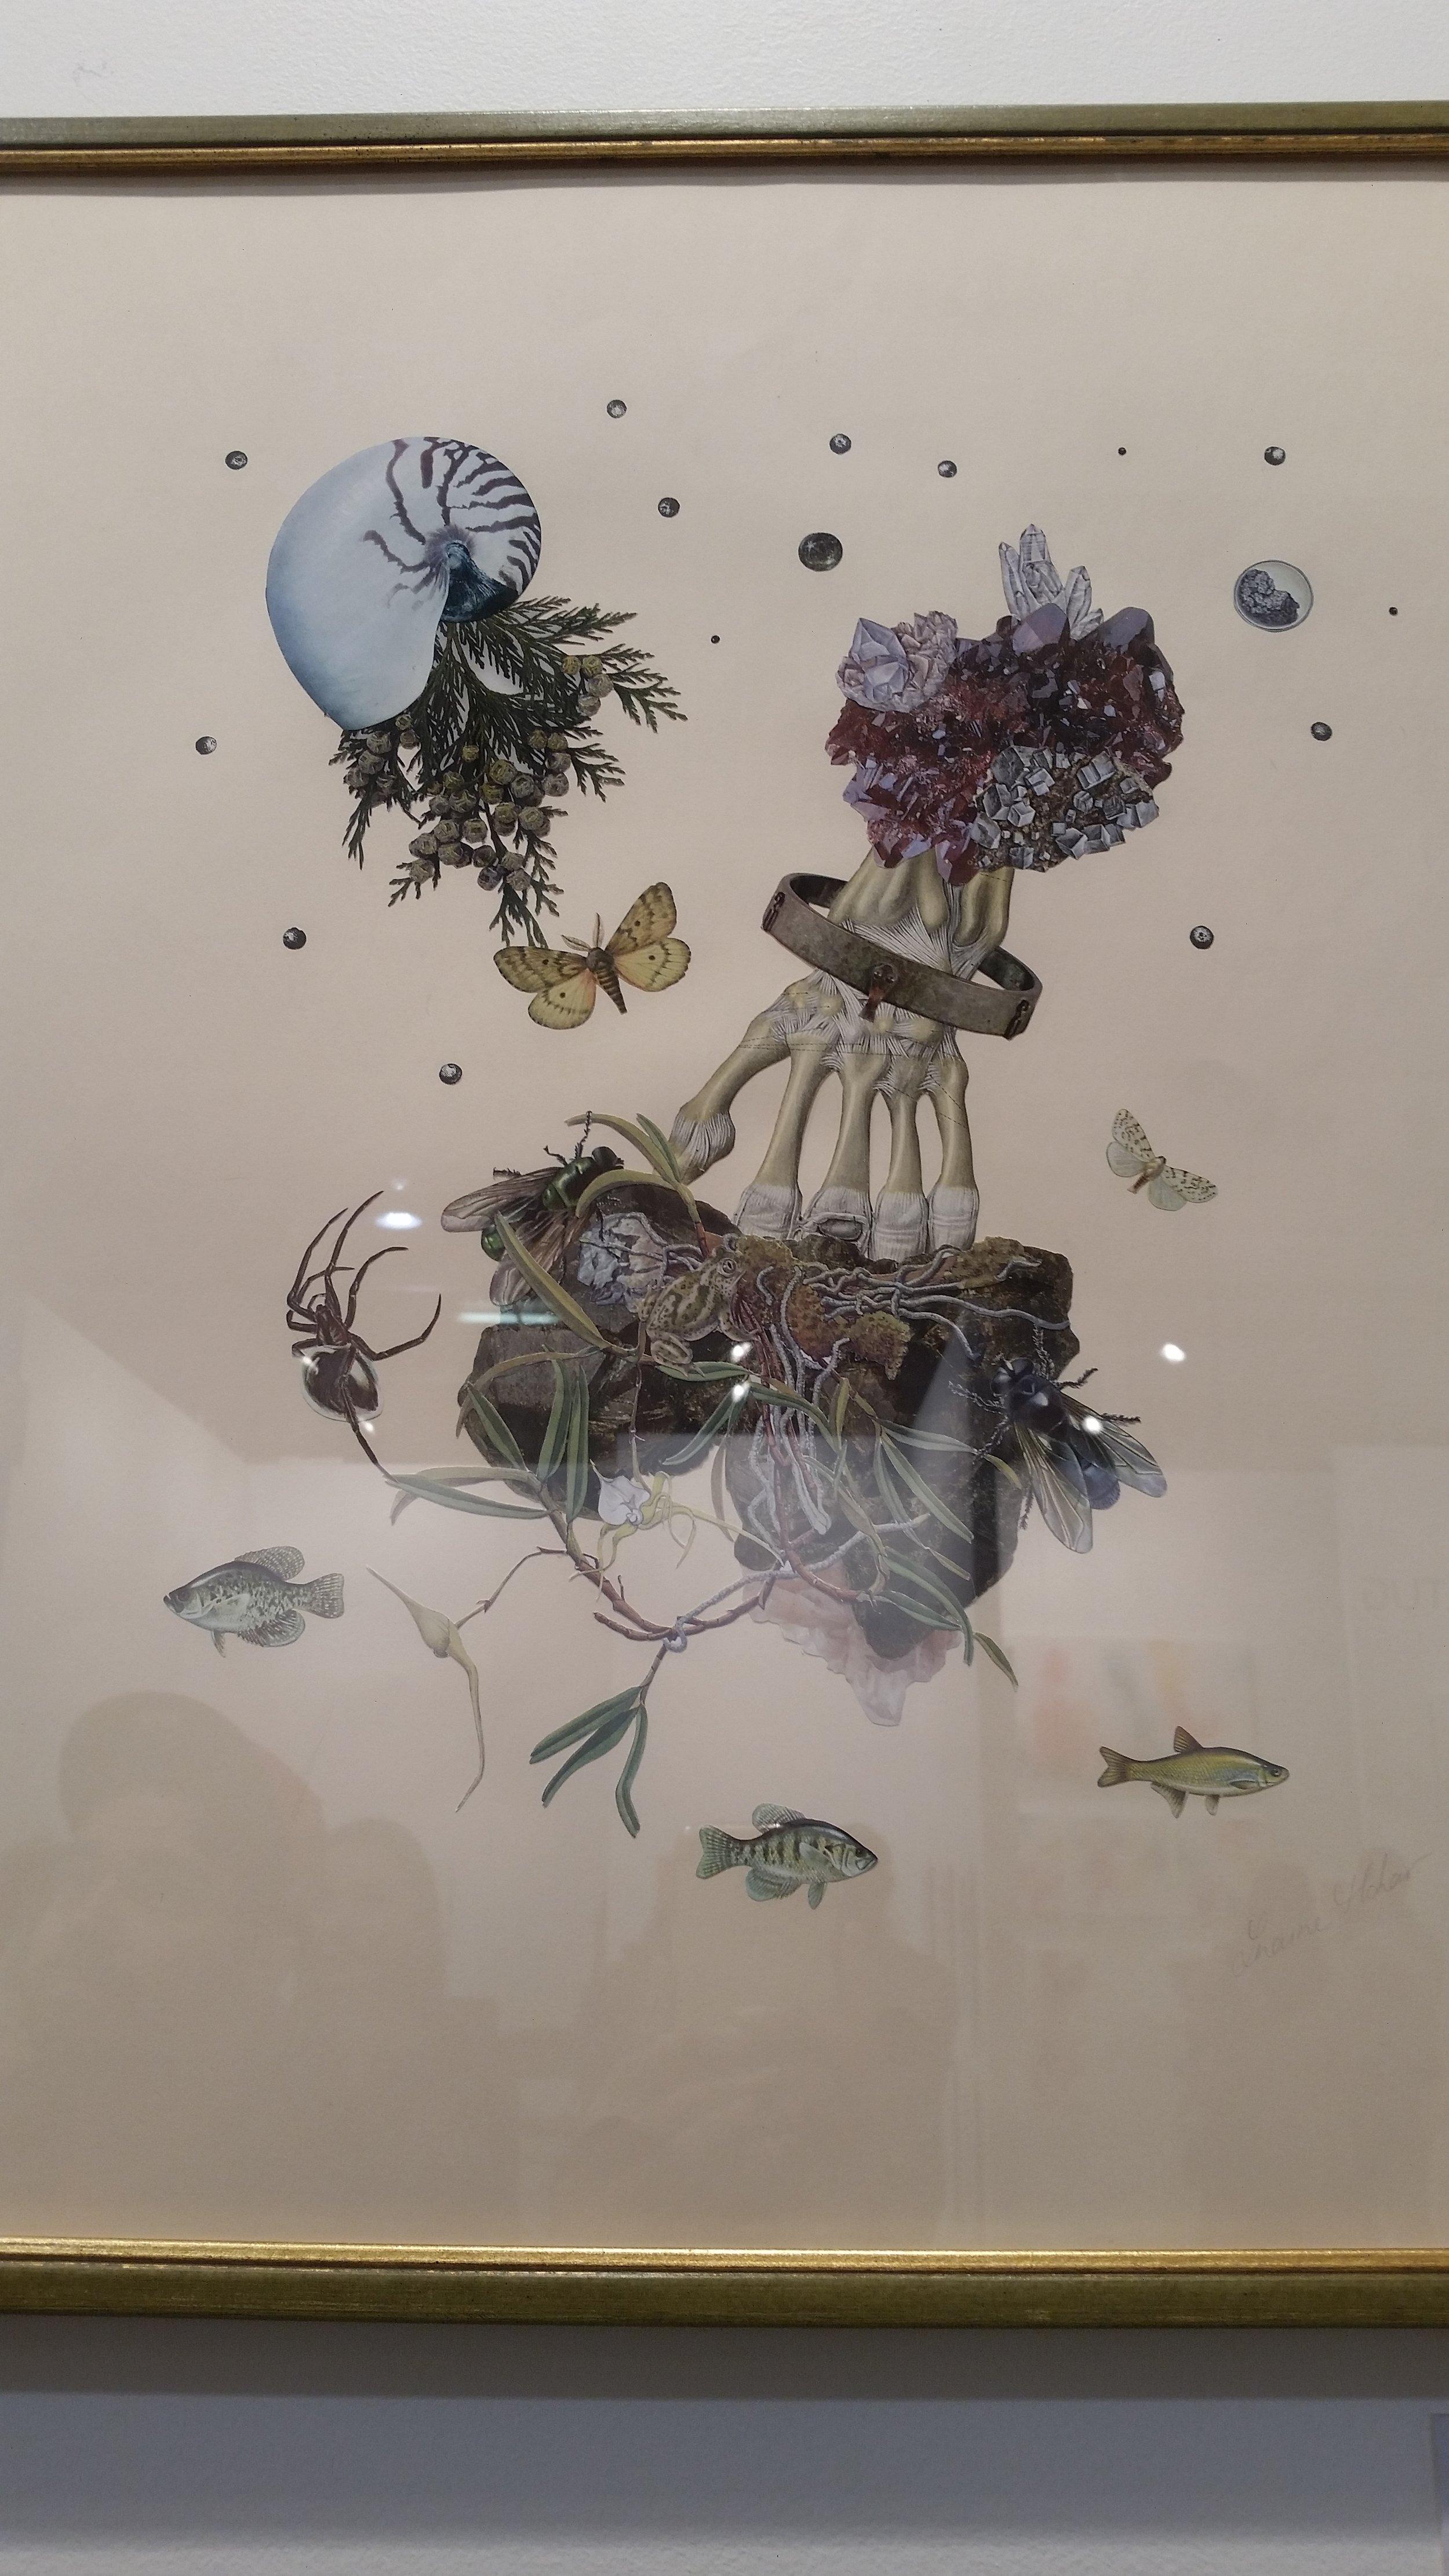 Fine art collage by Loraine Mohar